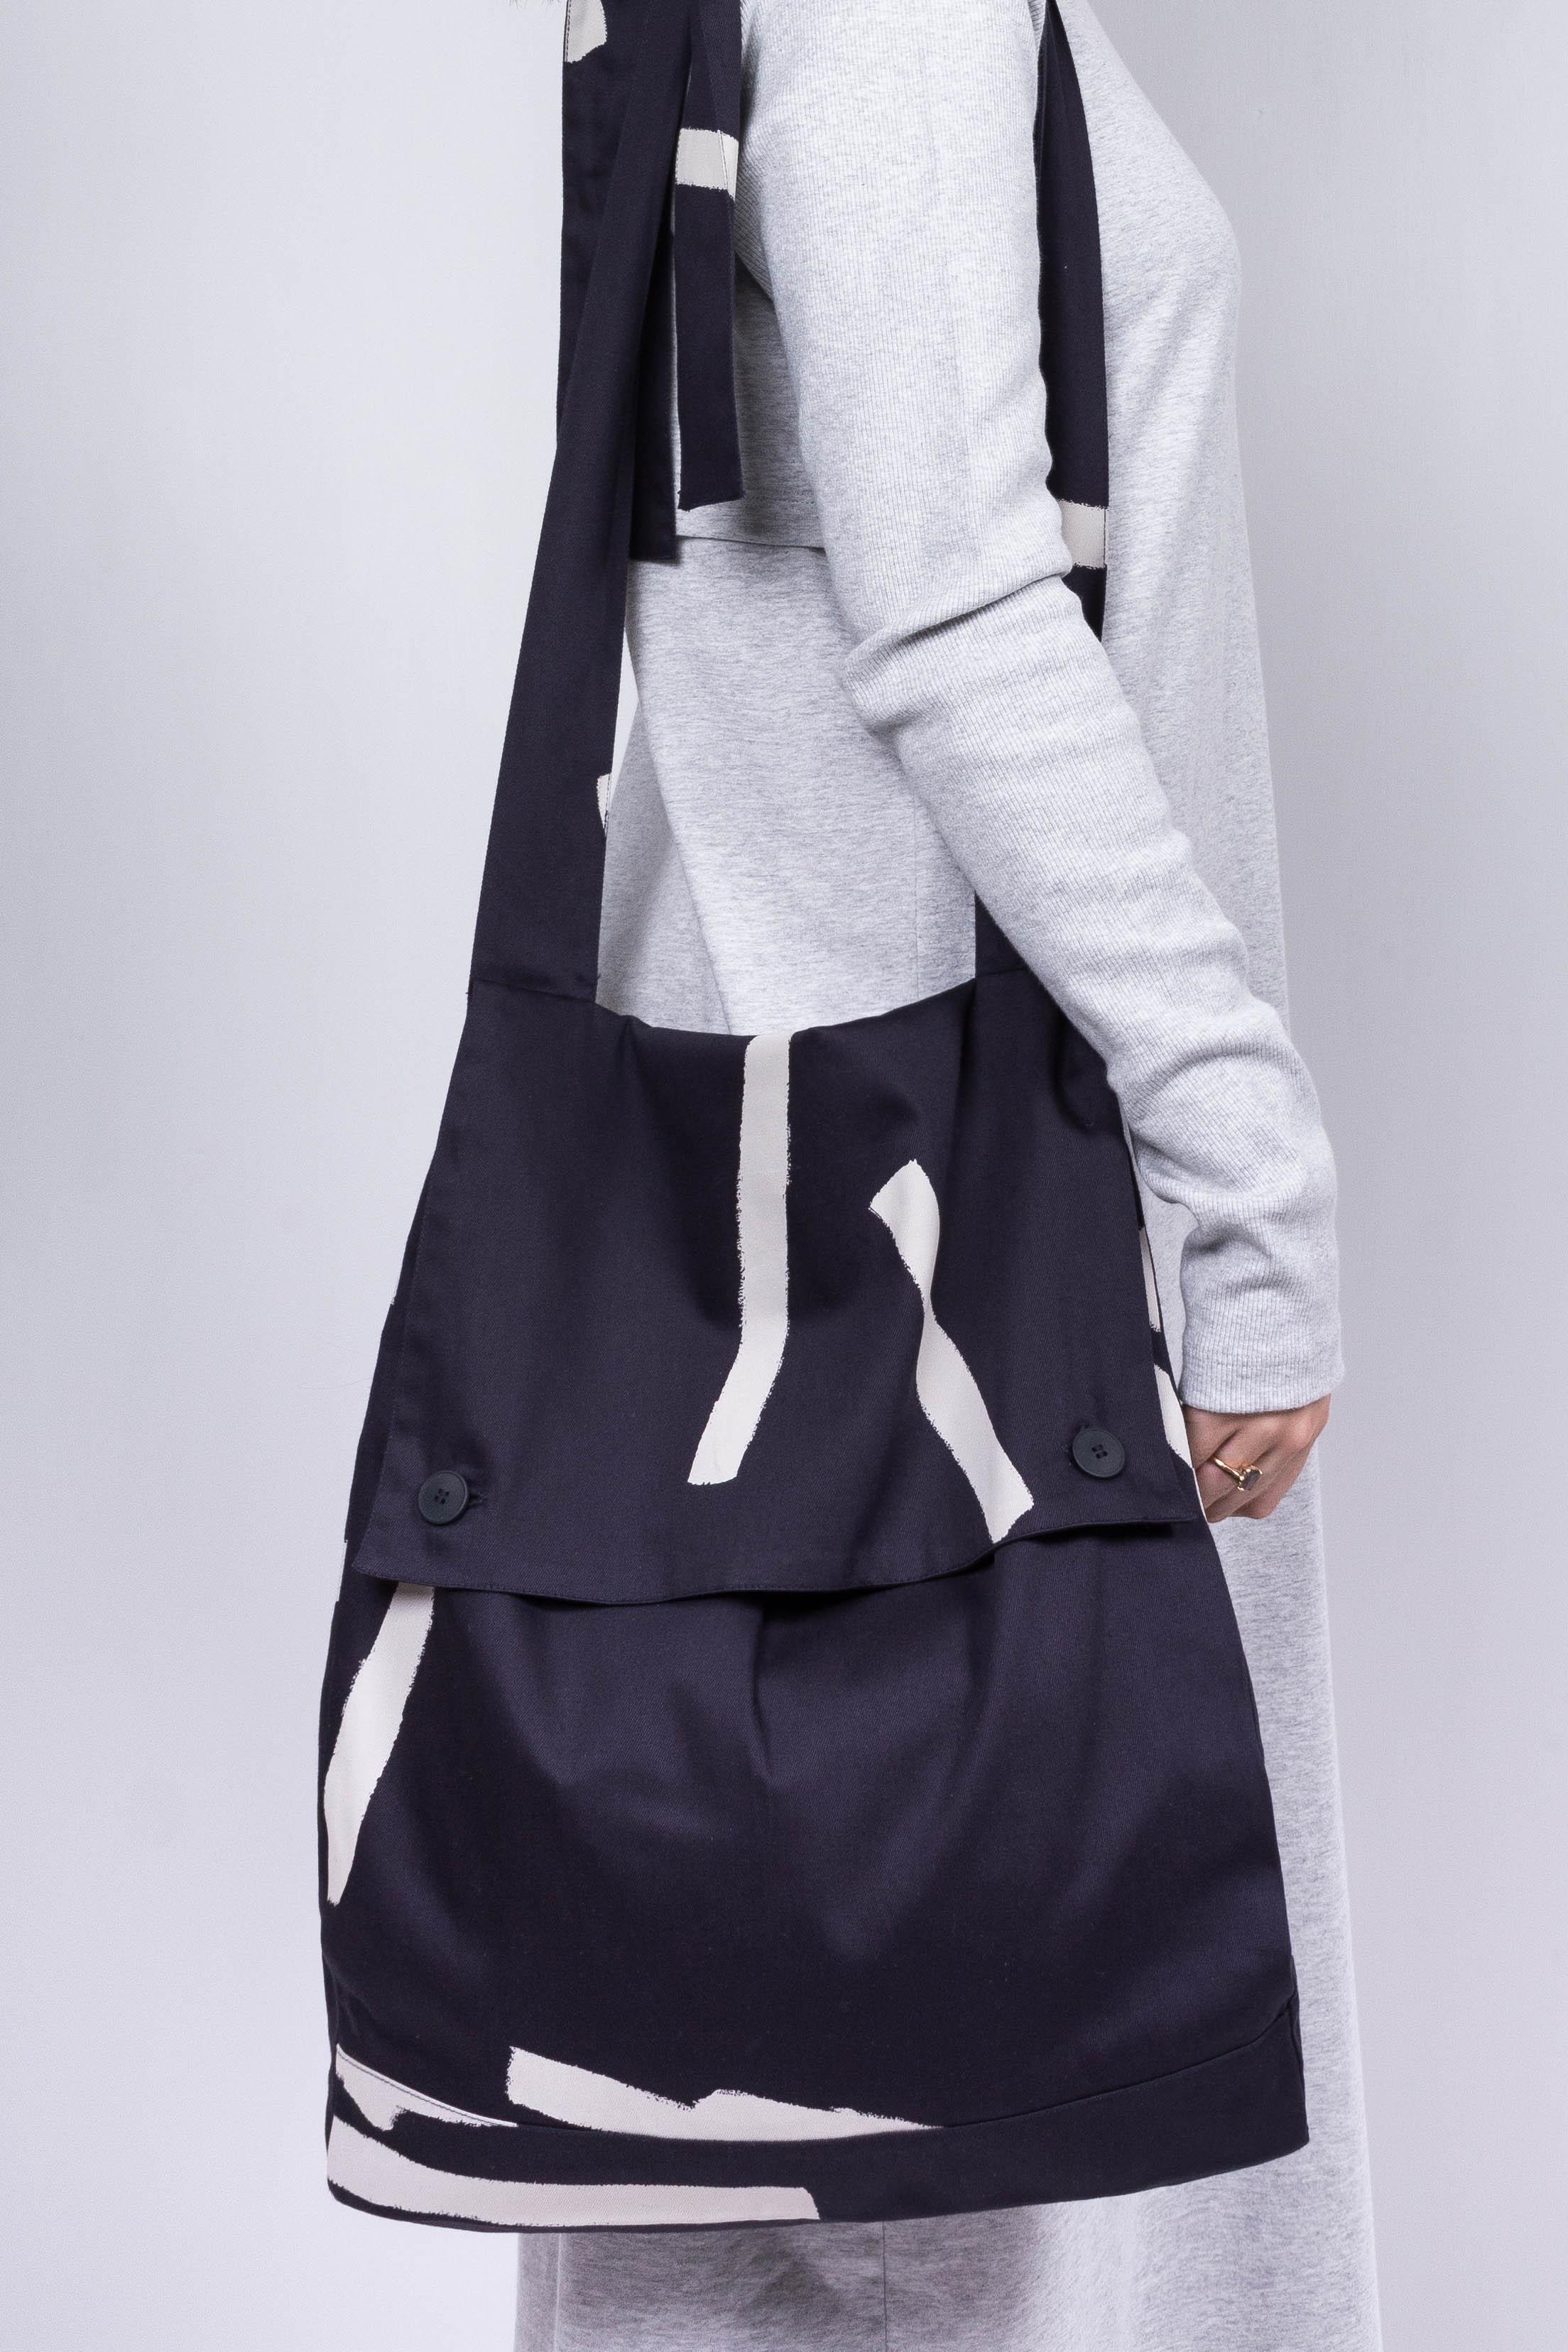 Kowtow Backpack NZD $89